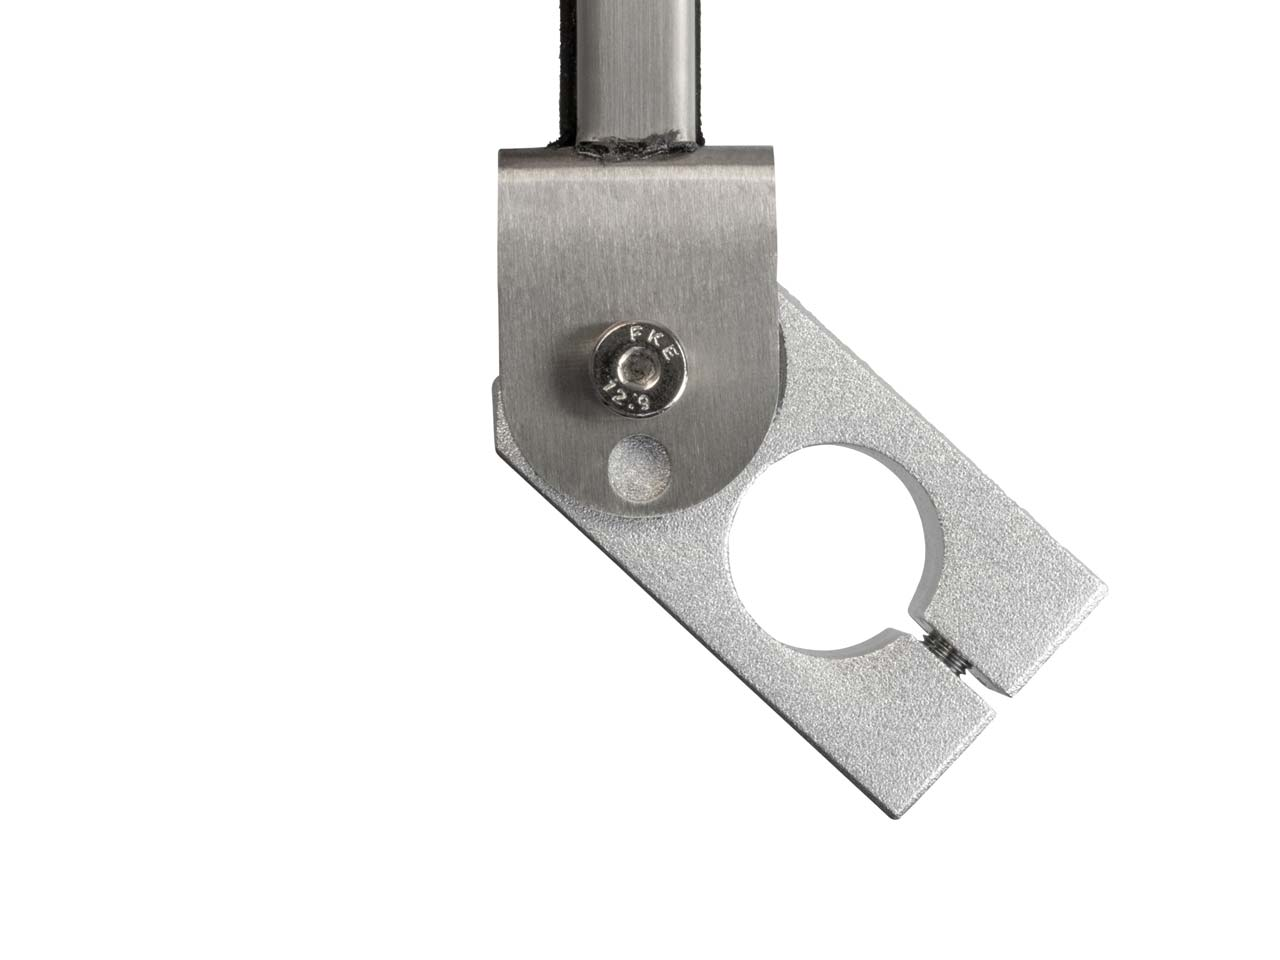 Genuine-US-Foredom-Workbench-Accessories-System miniatura 55